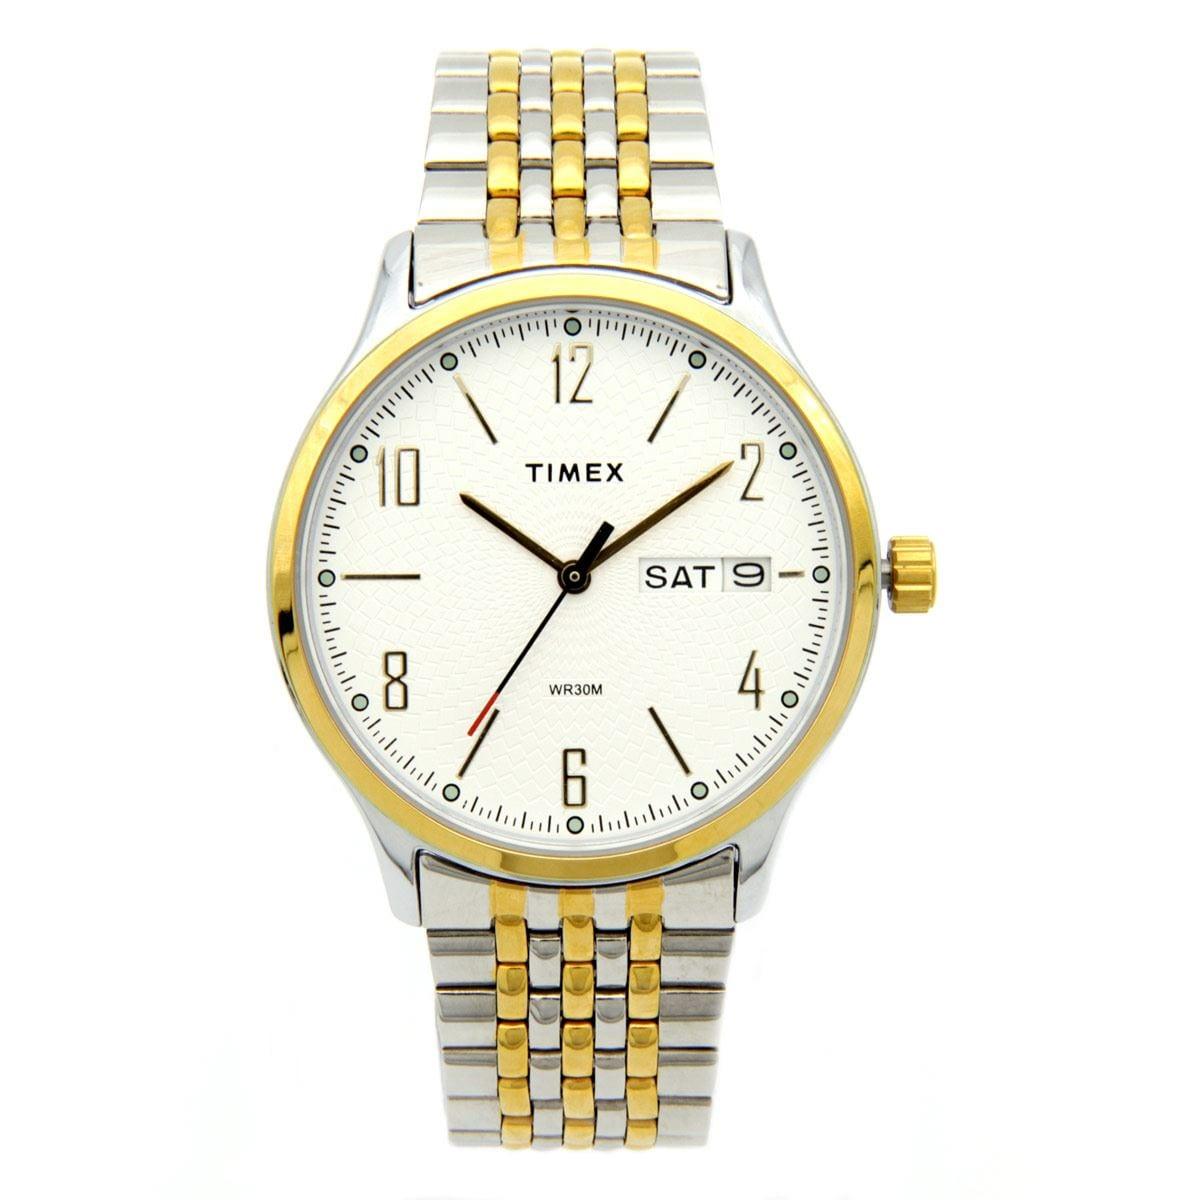 Reloj Timex Plateado y Dorado Para Caballero